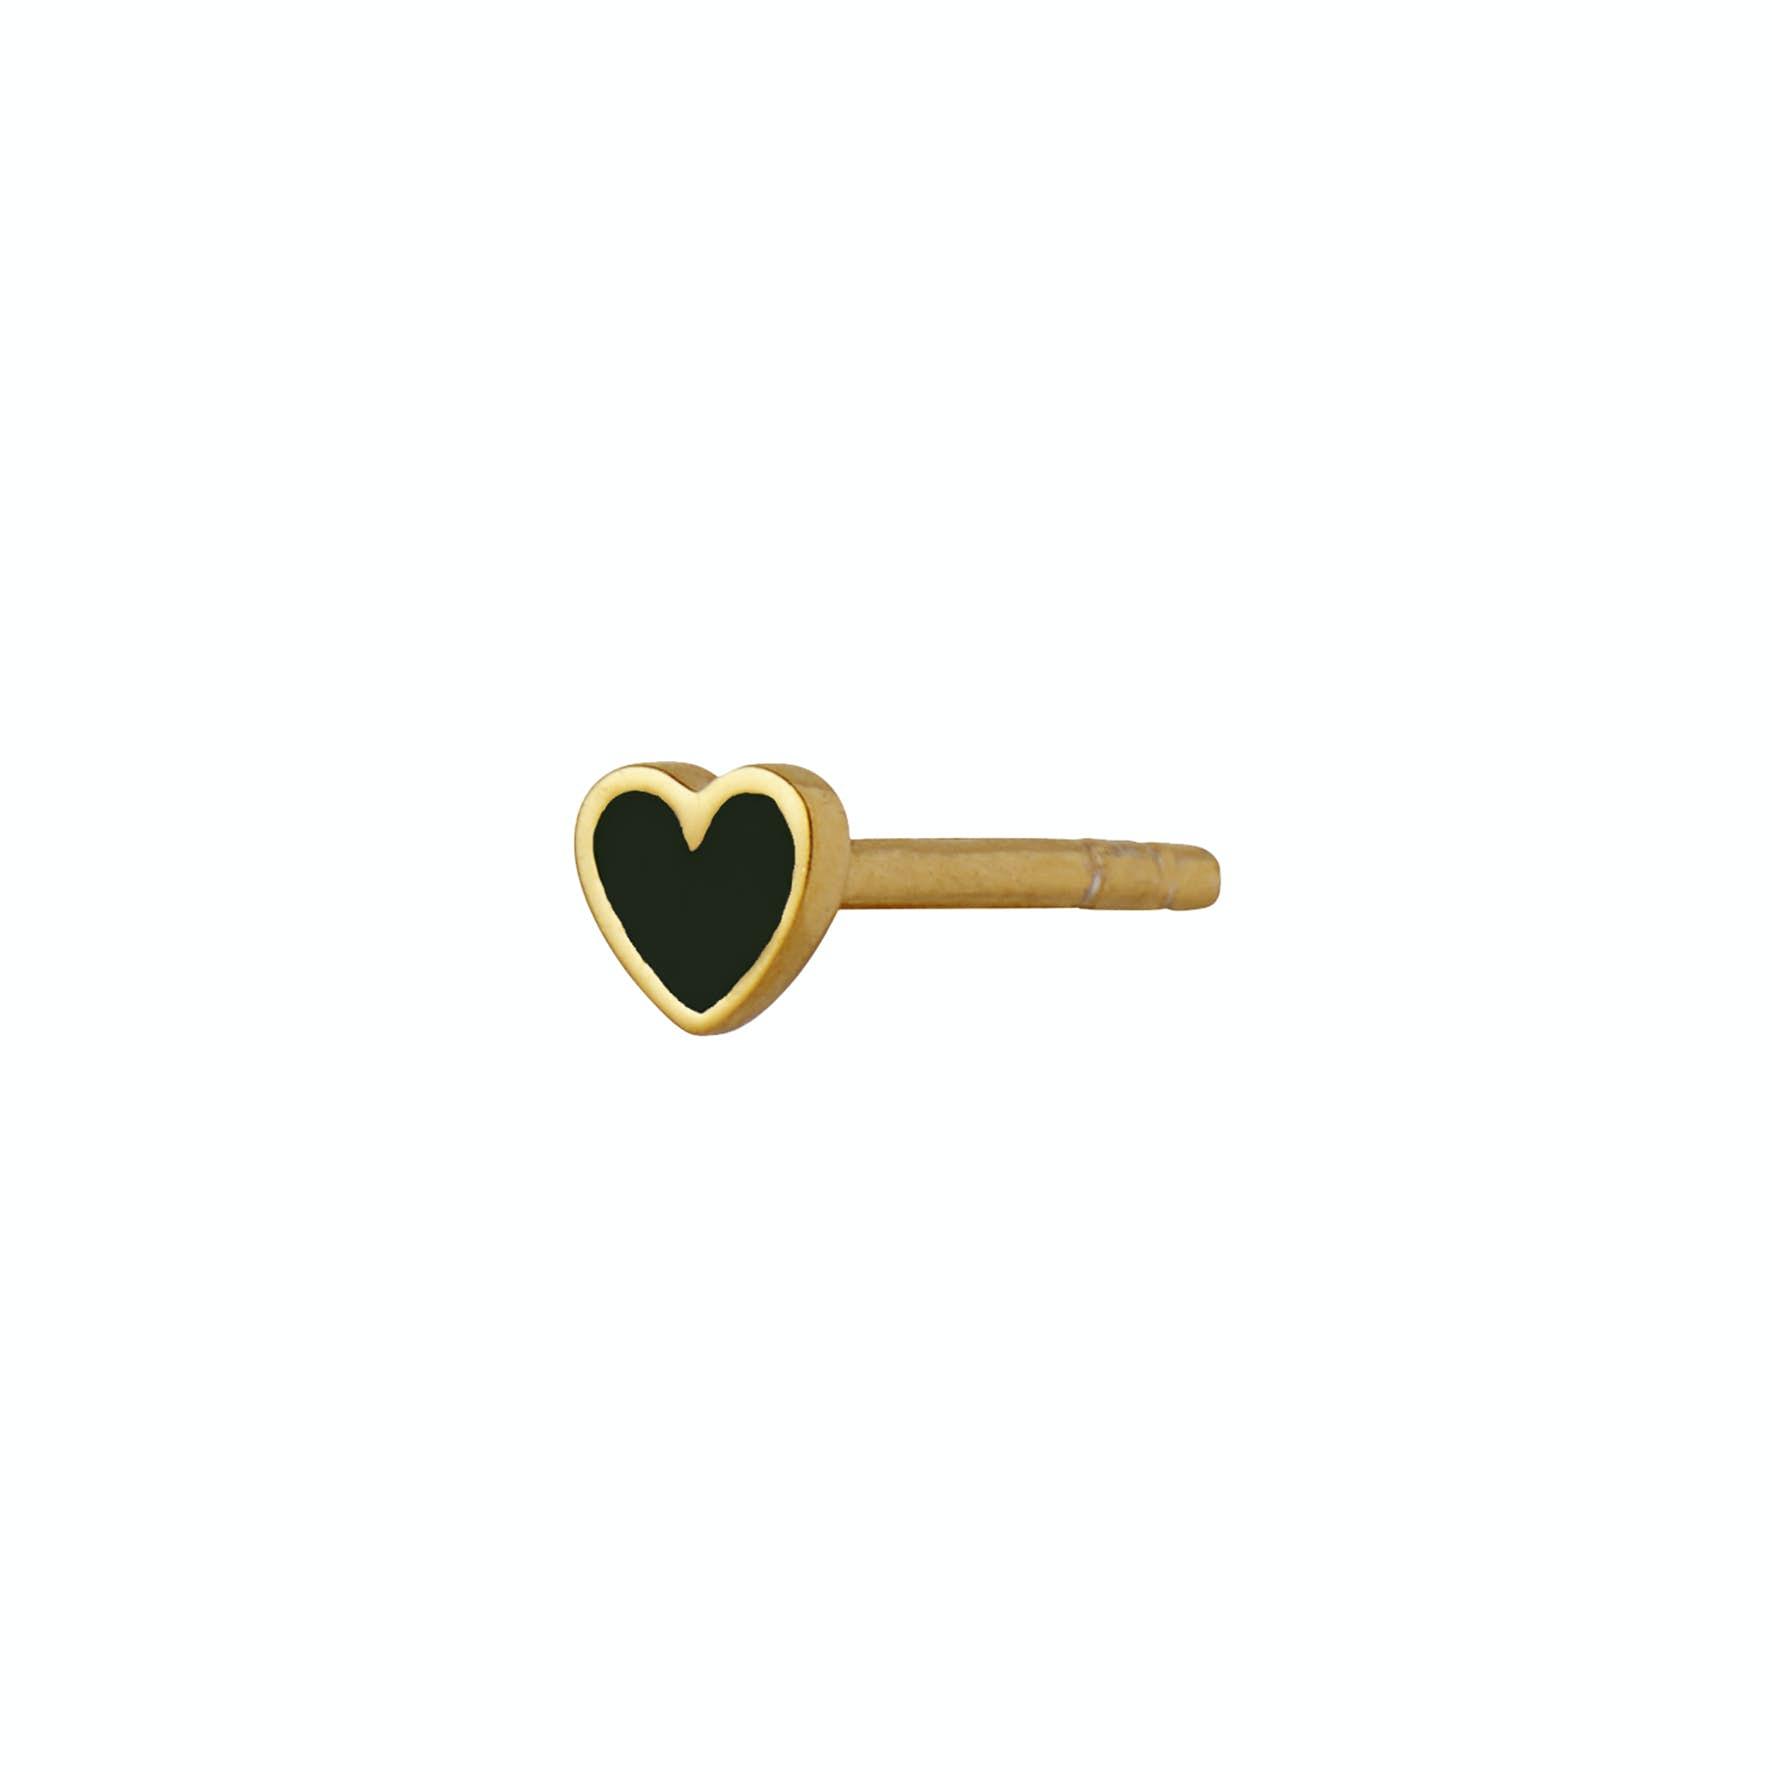 Petit Love Heart Earstick Black fra STINE A Jewelry i Forgylt-Sølv Sterling 925